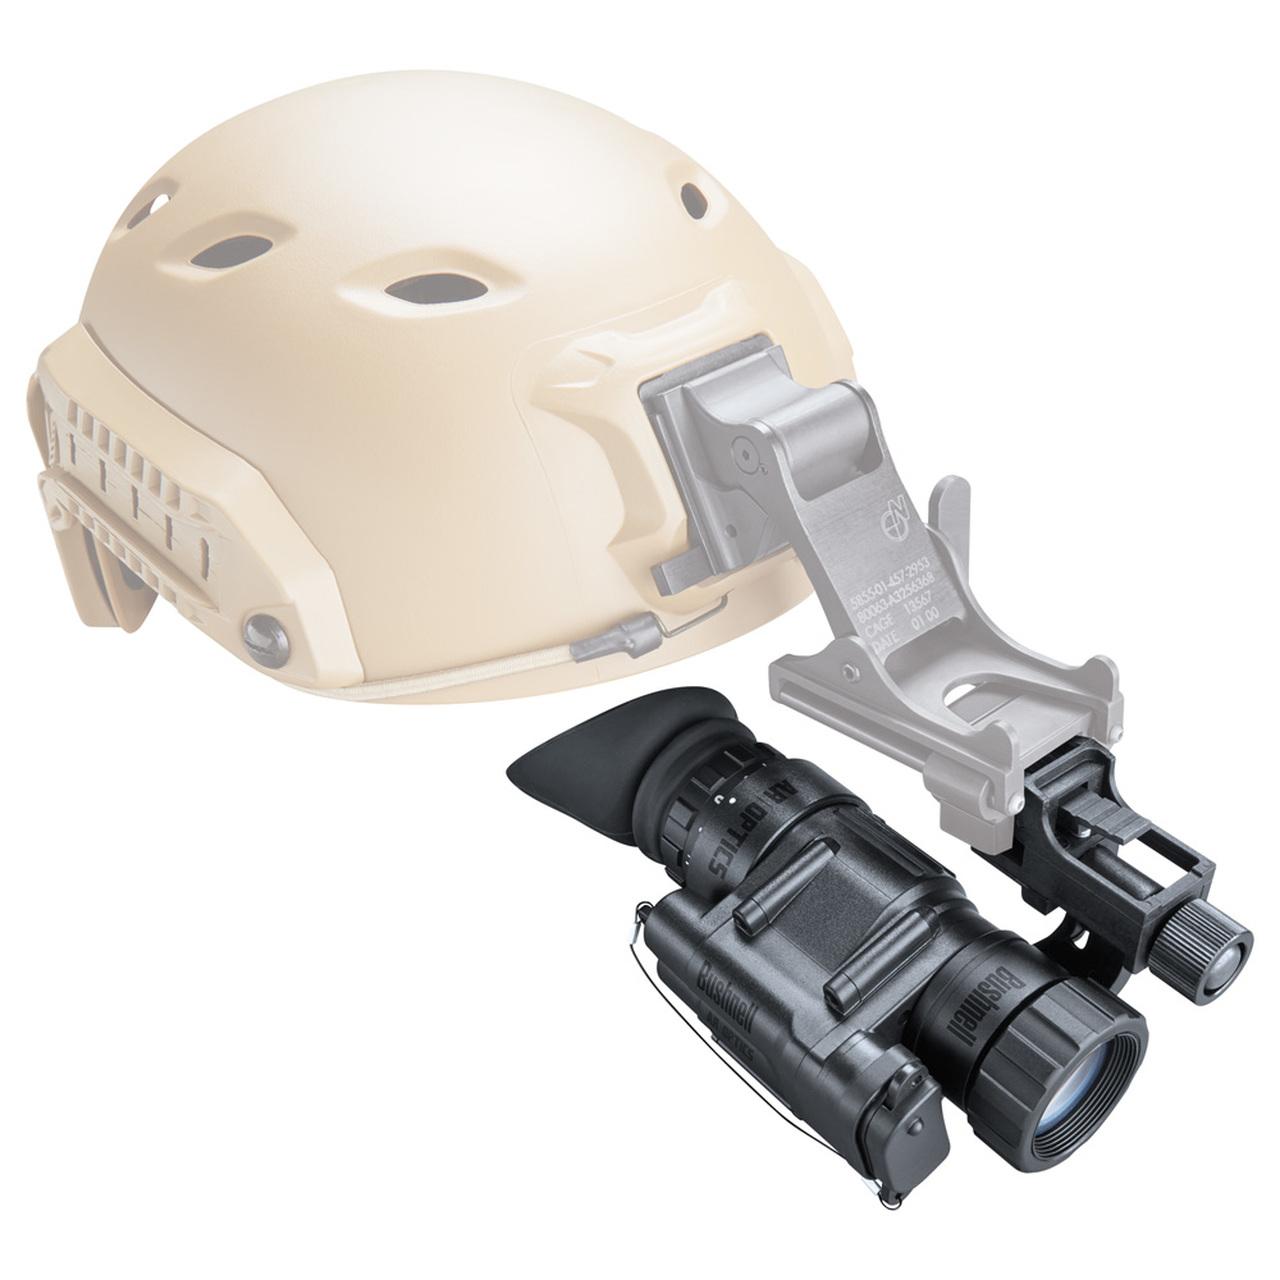 AR_Optics_Night_Vision_Digital_Sentry_Monocular_2x28mm_AR142BK_Angle_On_Helmet__62665.1550865207